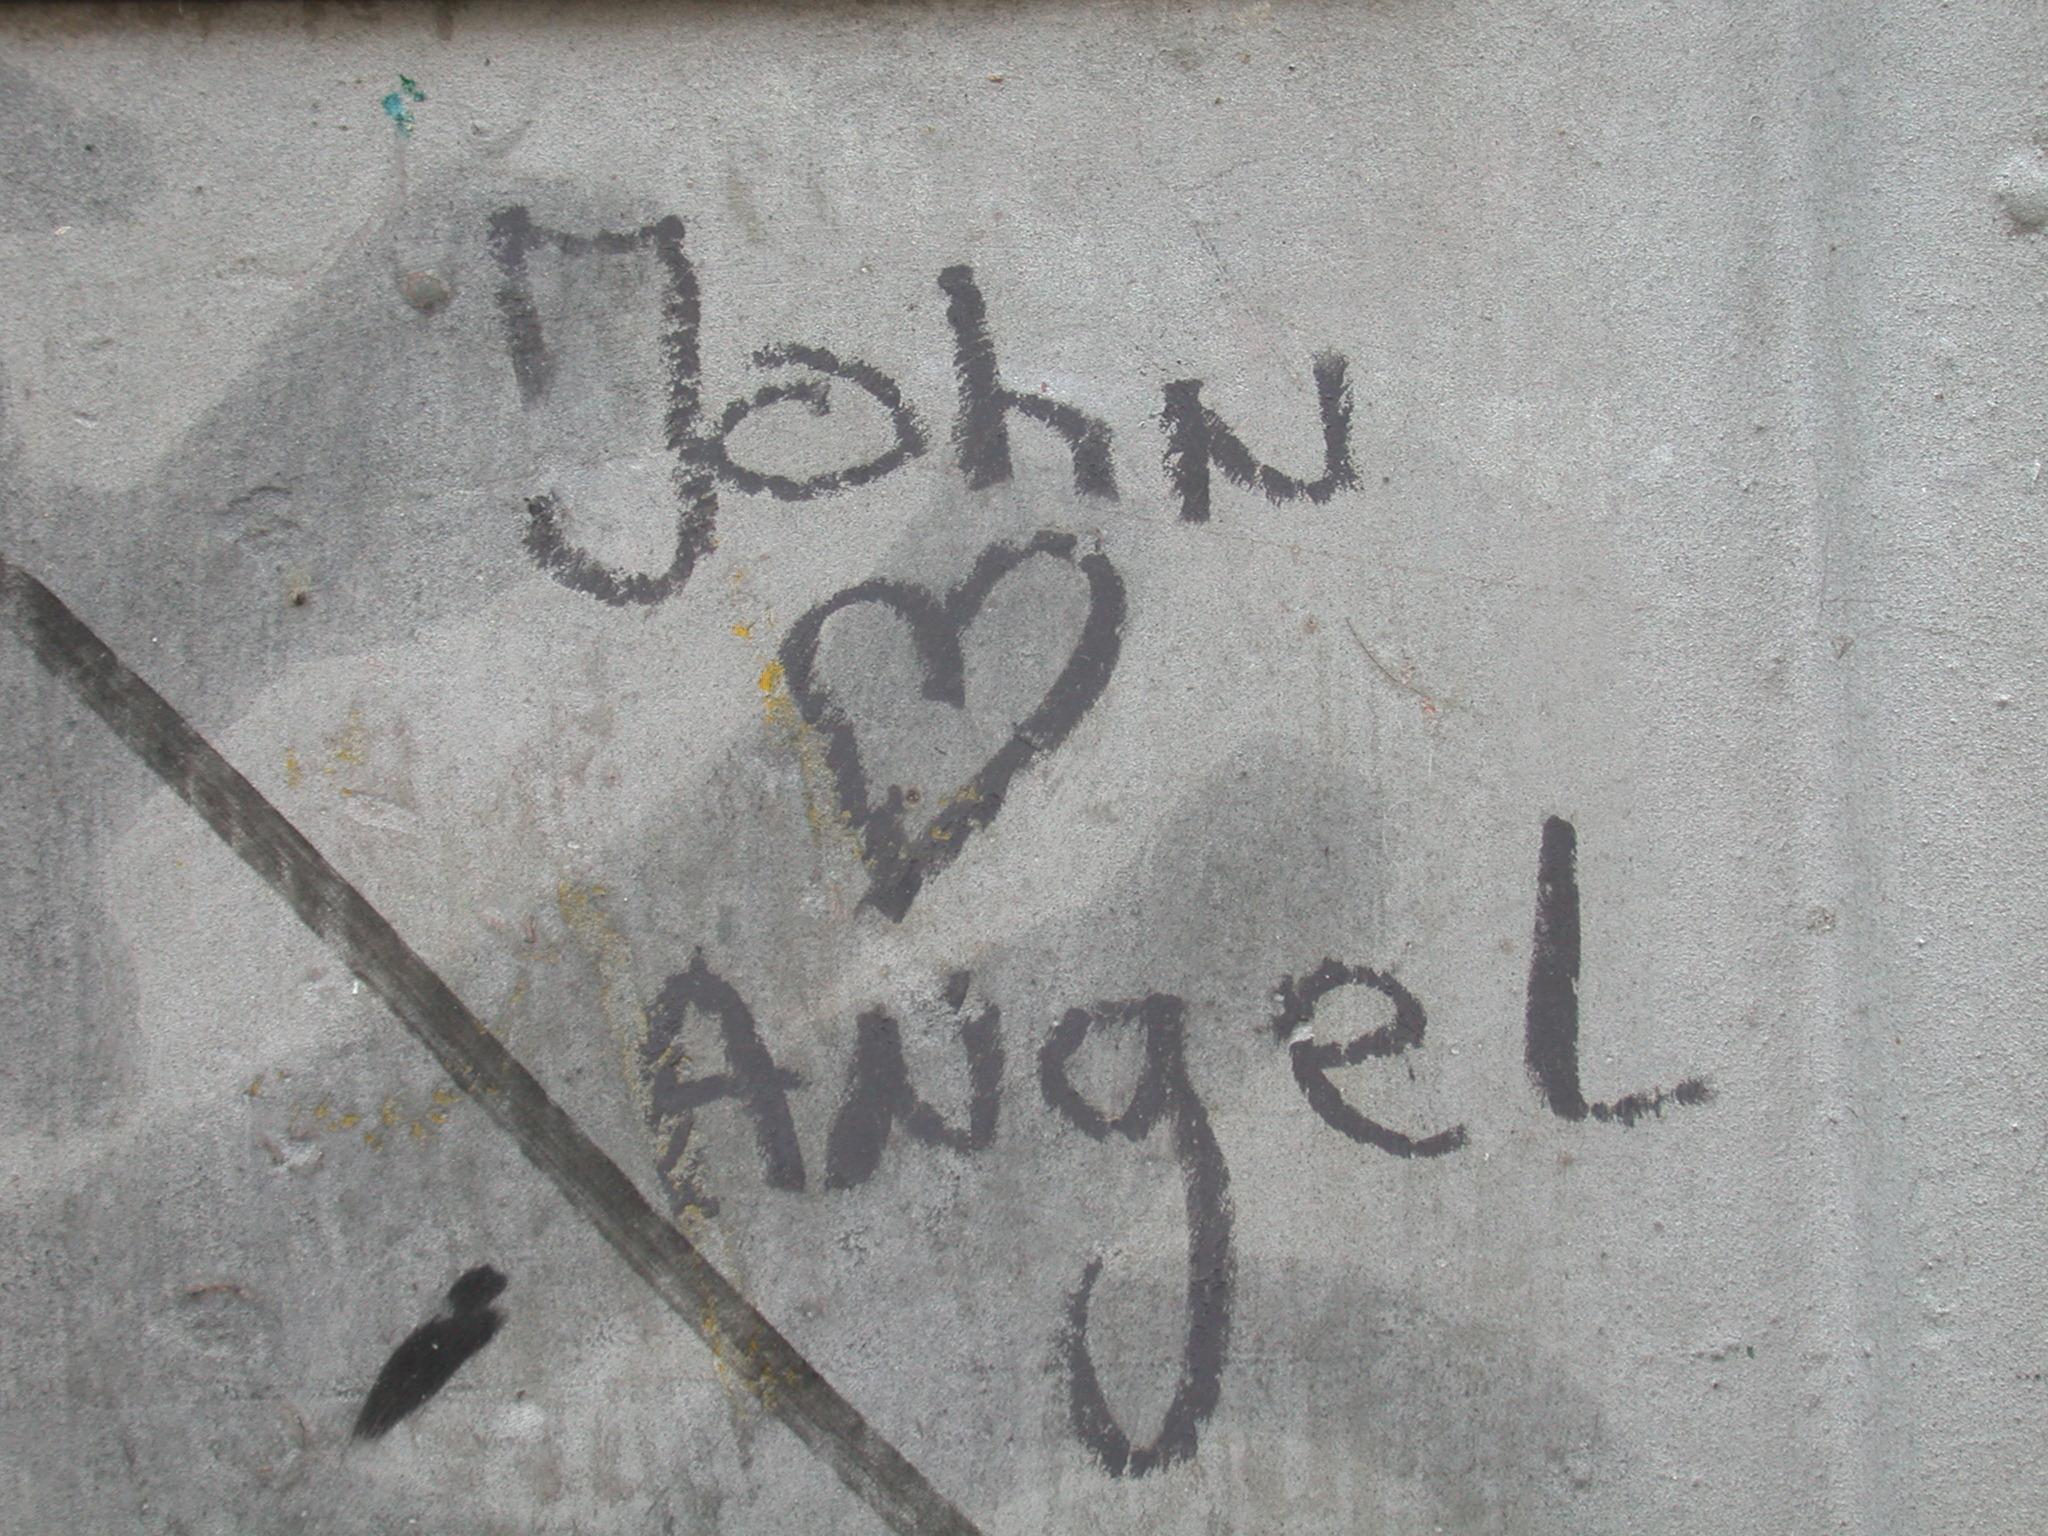 john loves angel graffiti spray paint wall hearth script text